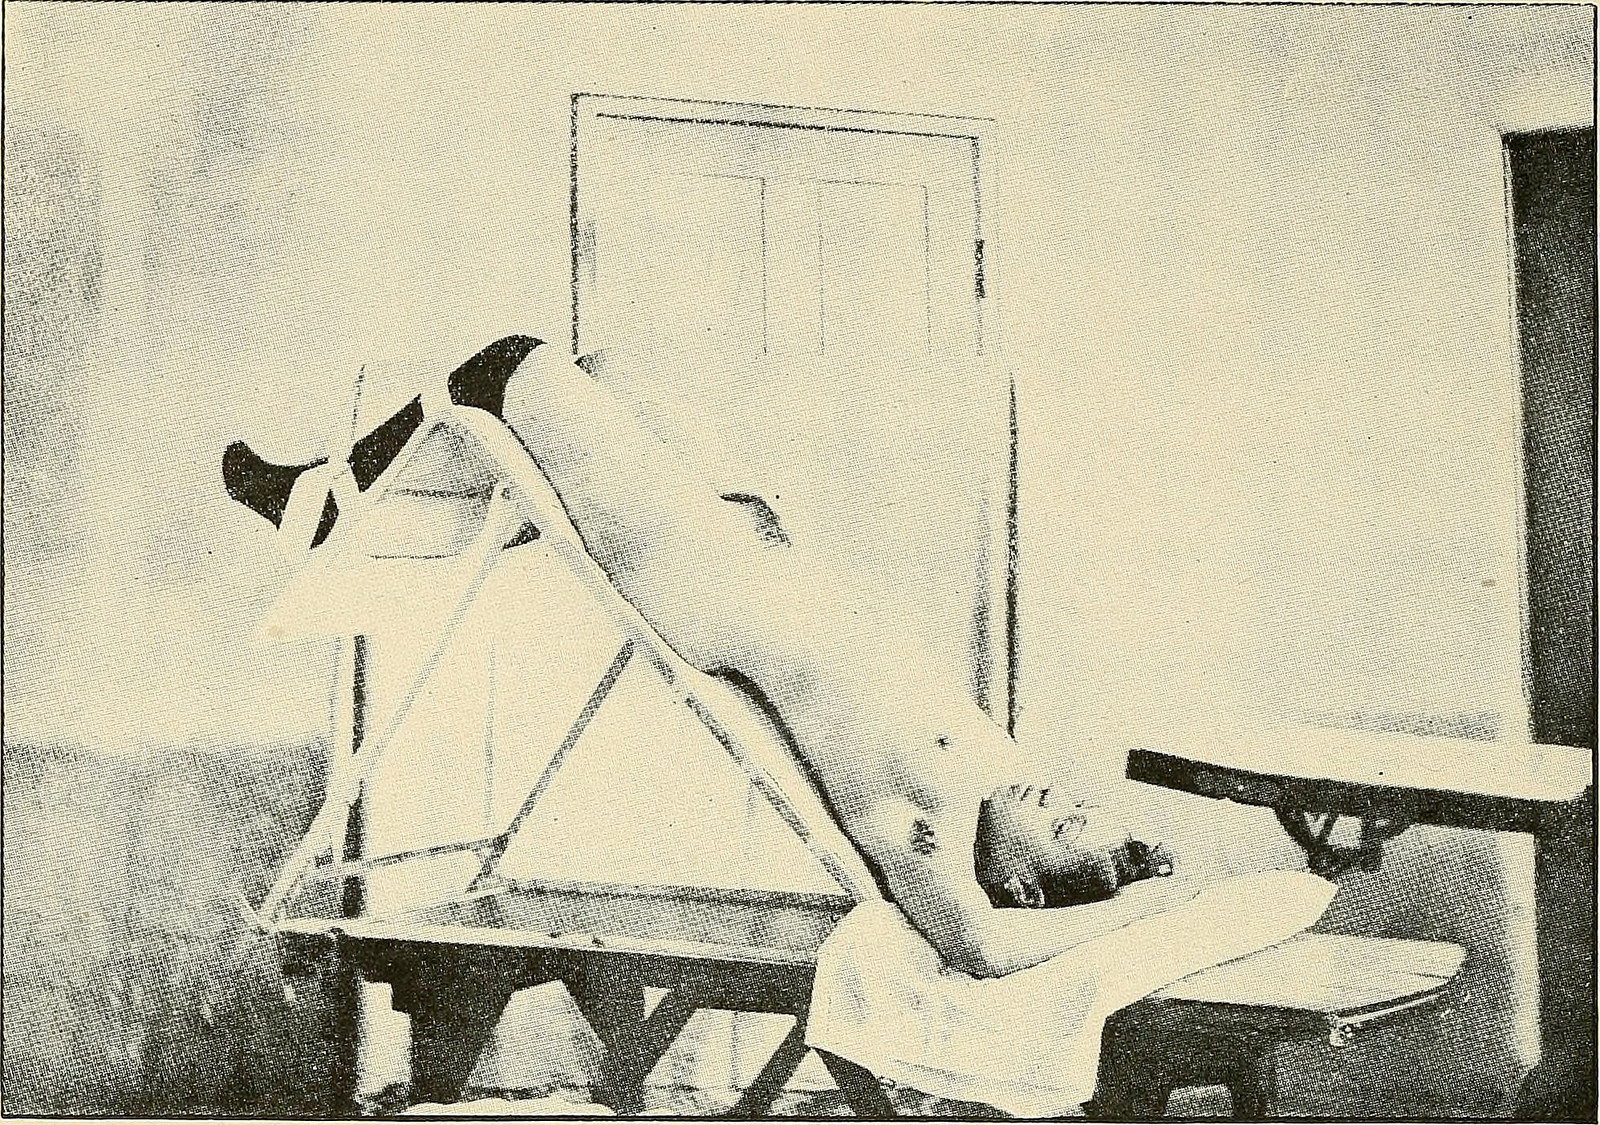 Postura de exploración ginecológica en un manual médico de 1907